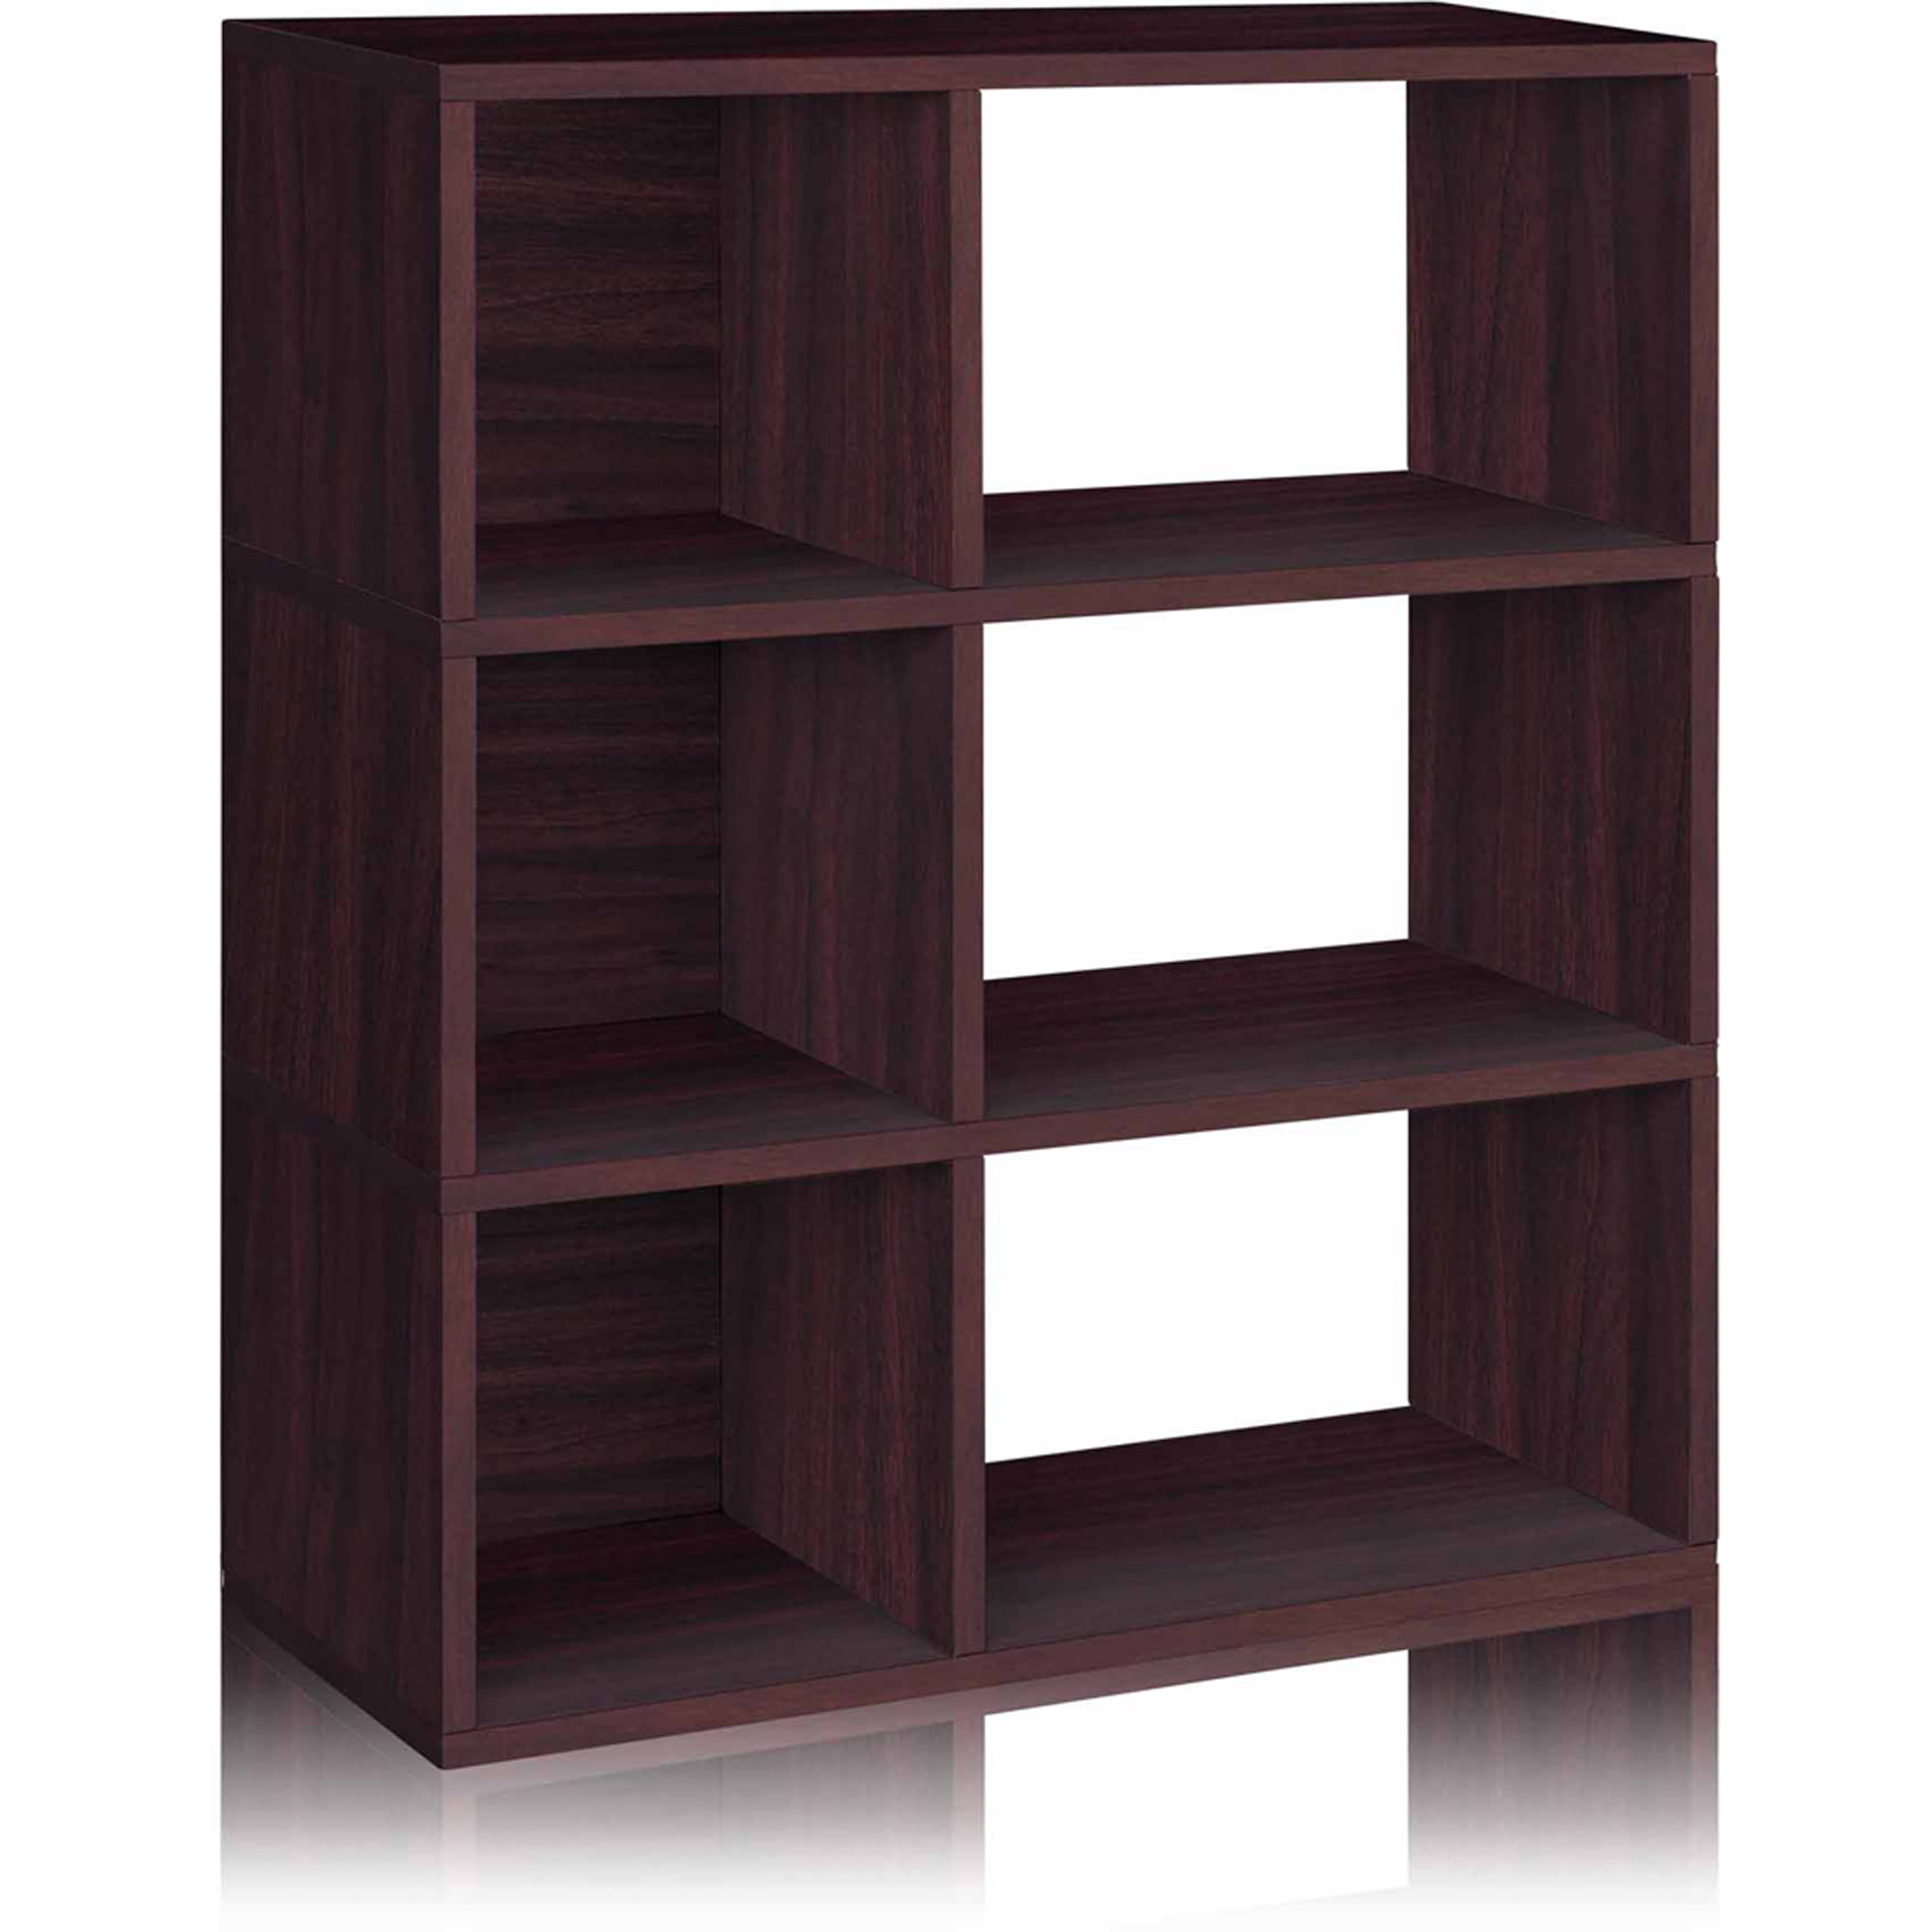 Way Basics Eco 3-Shelf Sutton Bookcase and Cubby Storage, Espresso